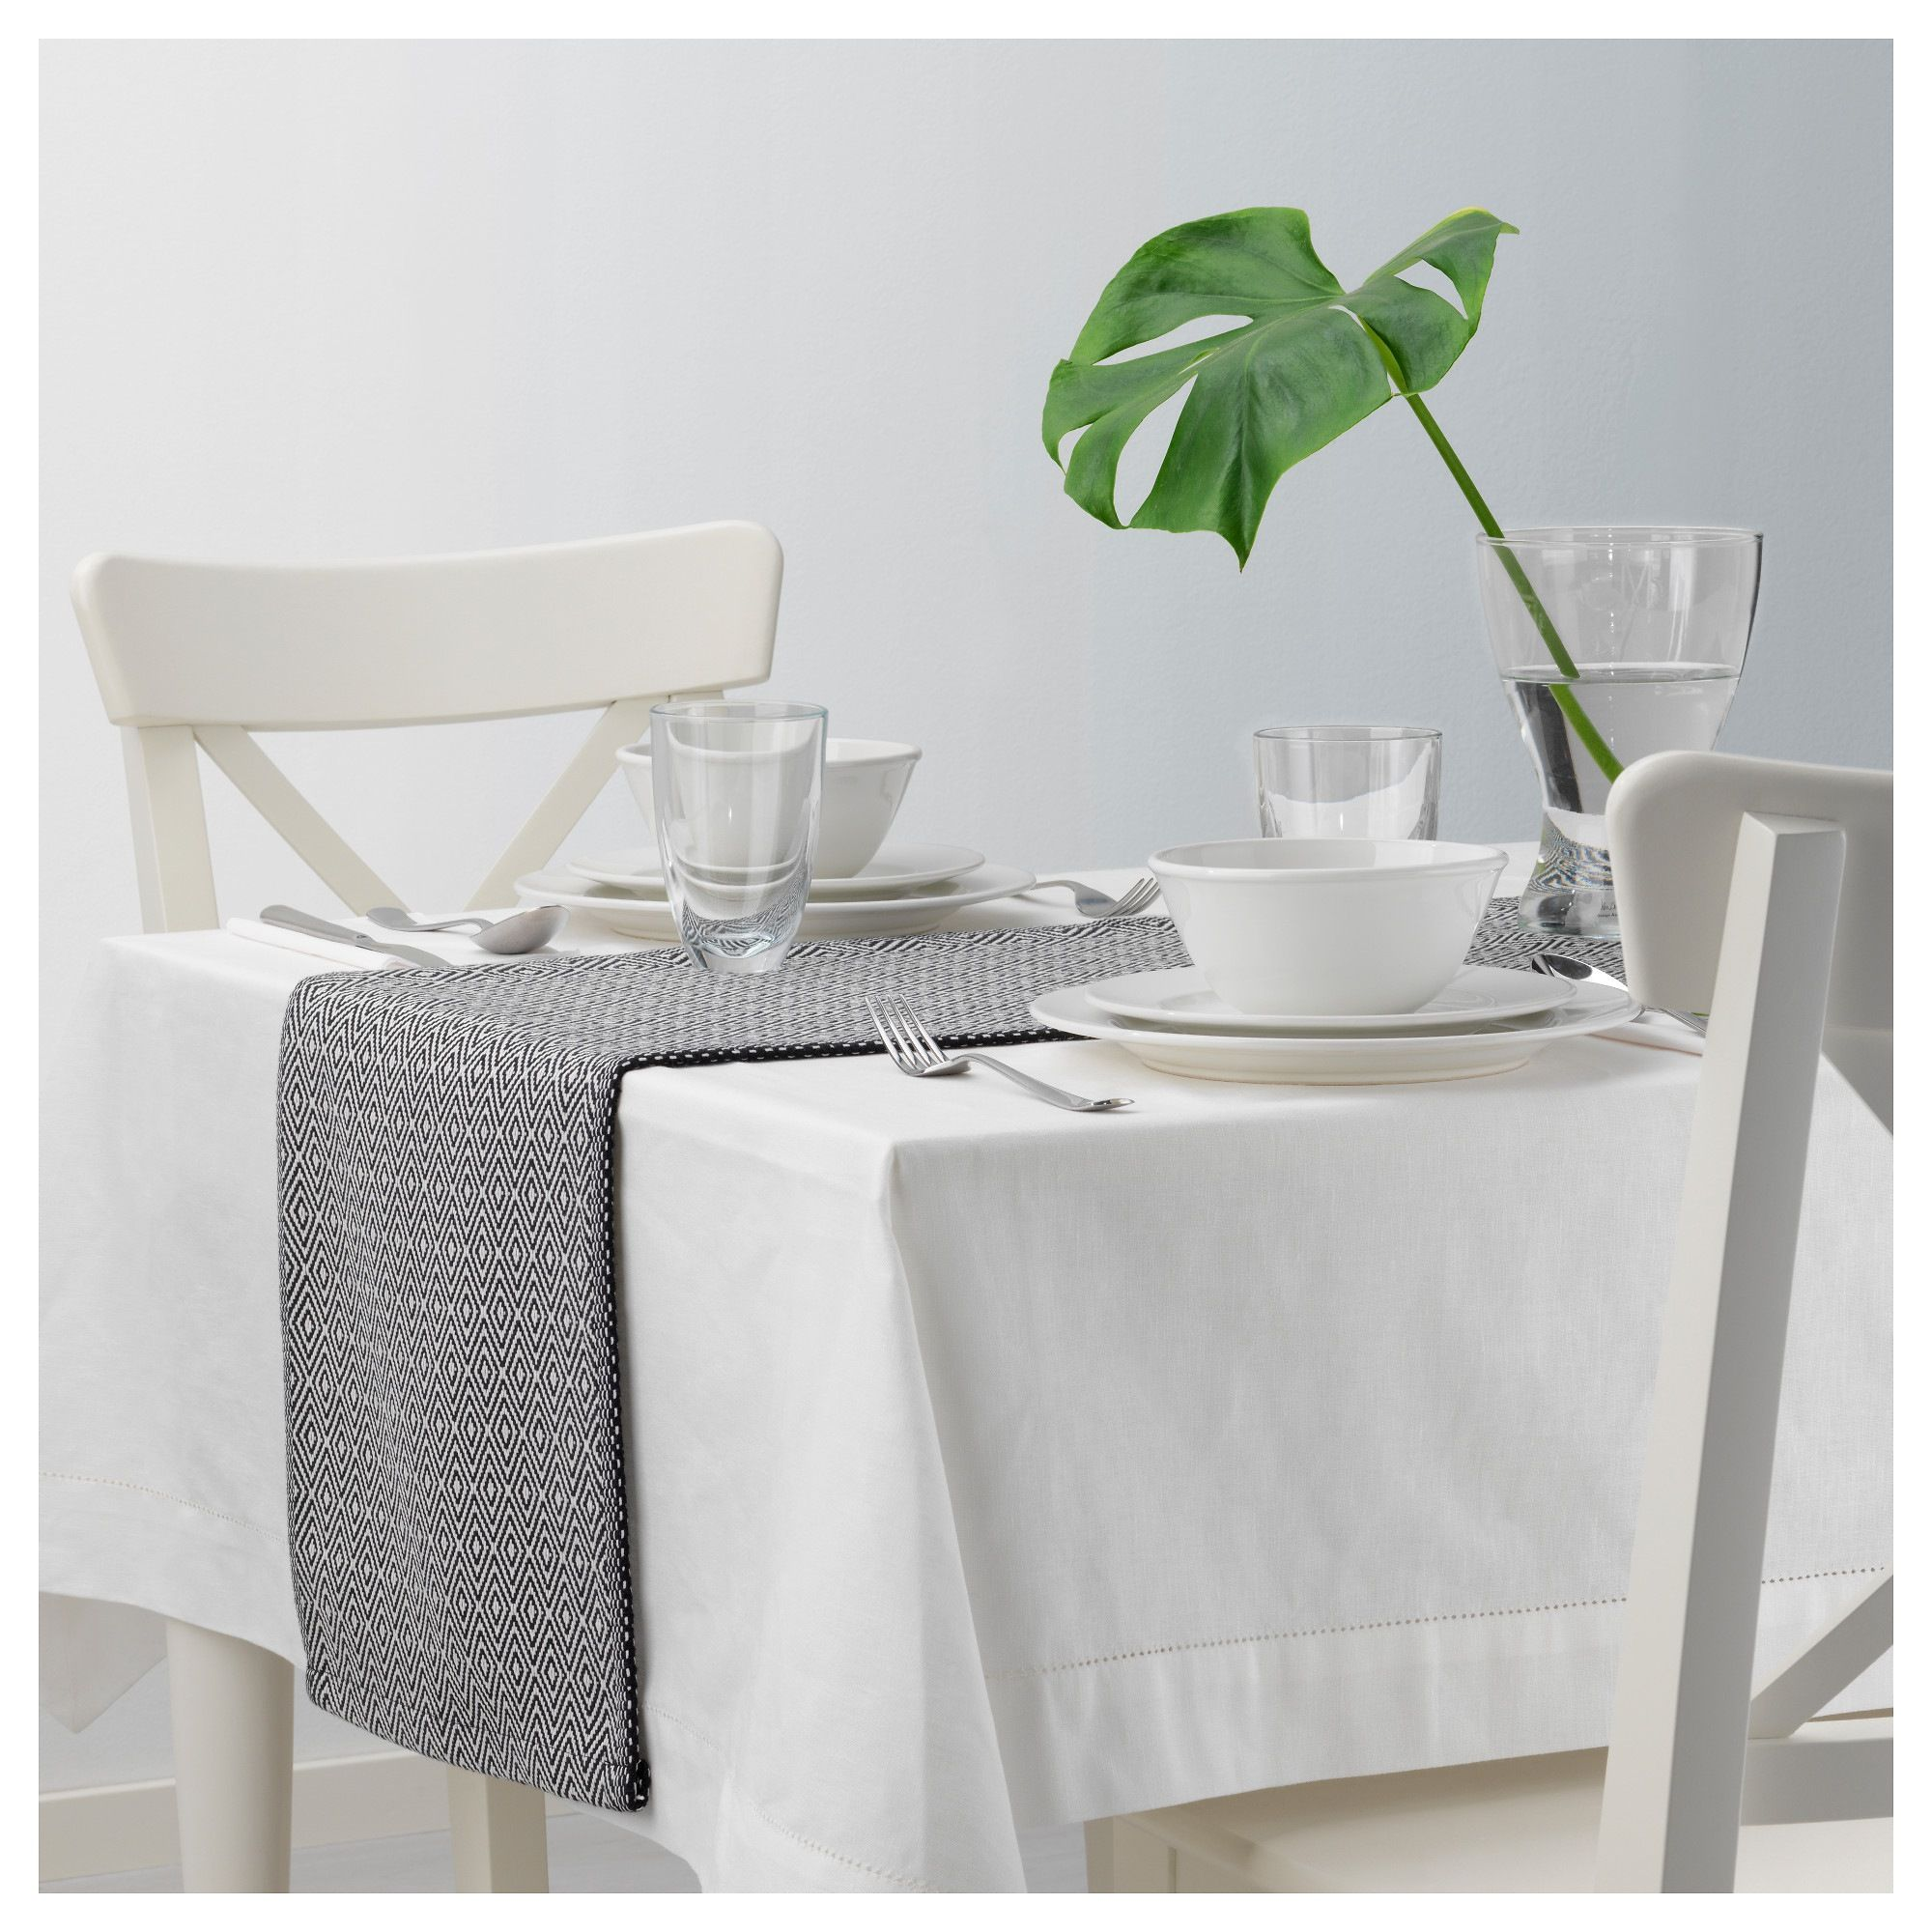 Ikea Goddag Black White Table Runner Ikea Ikea Table Table